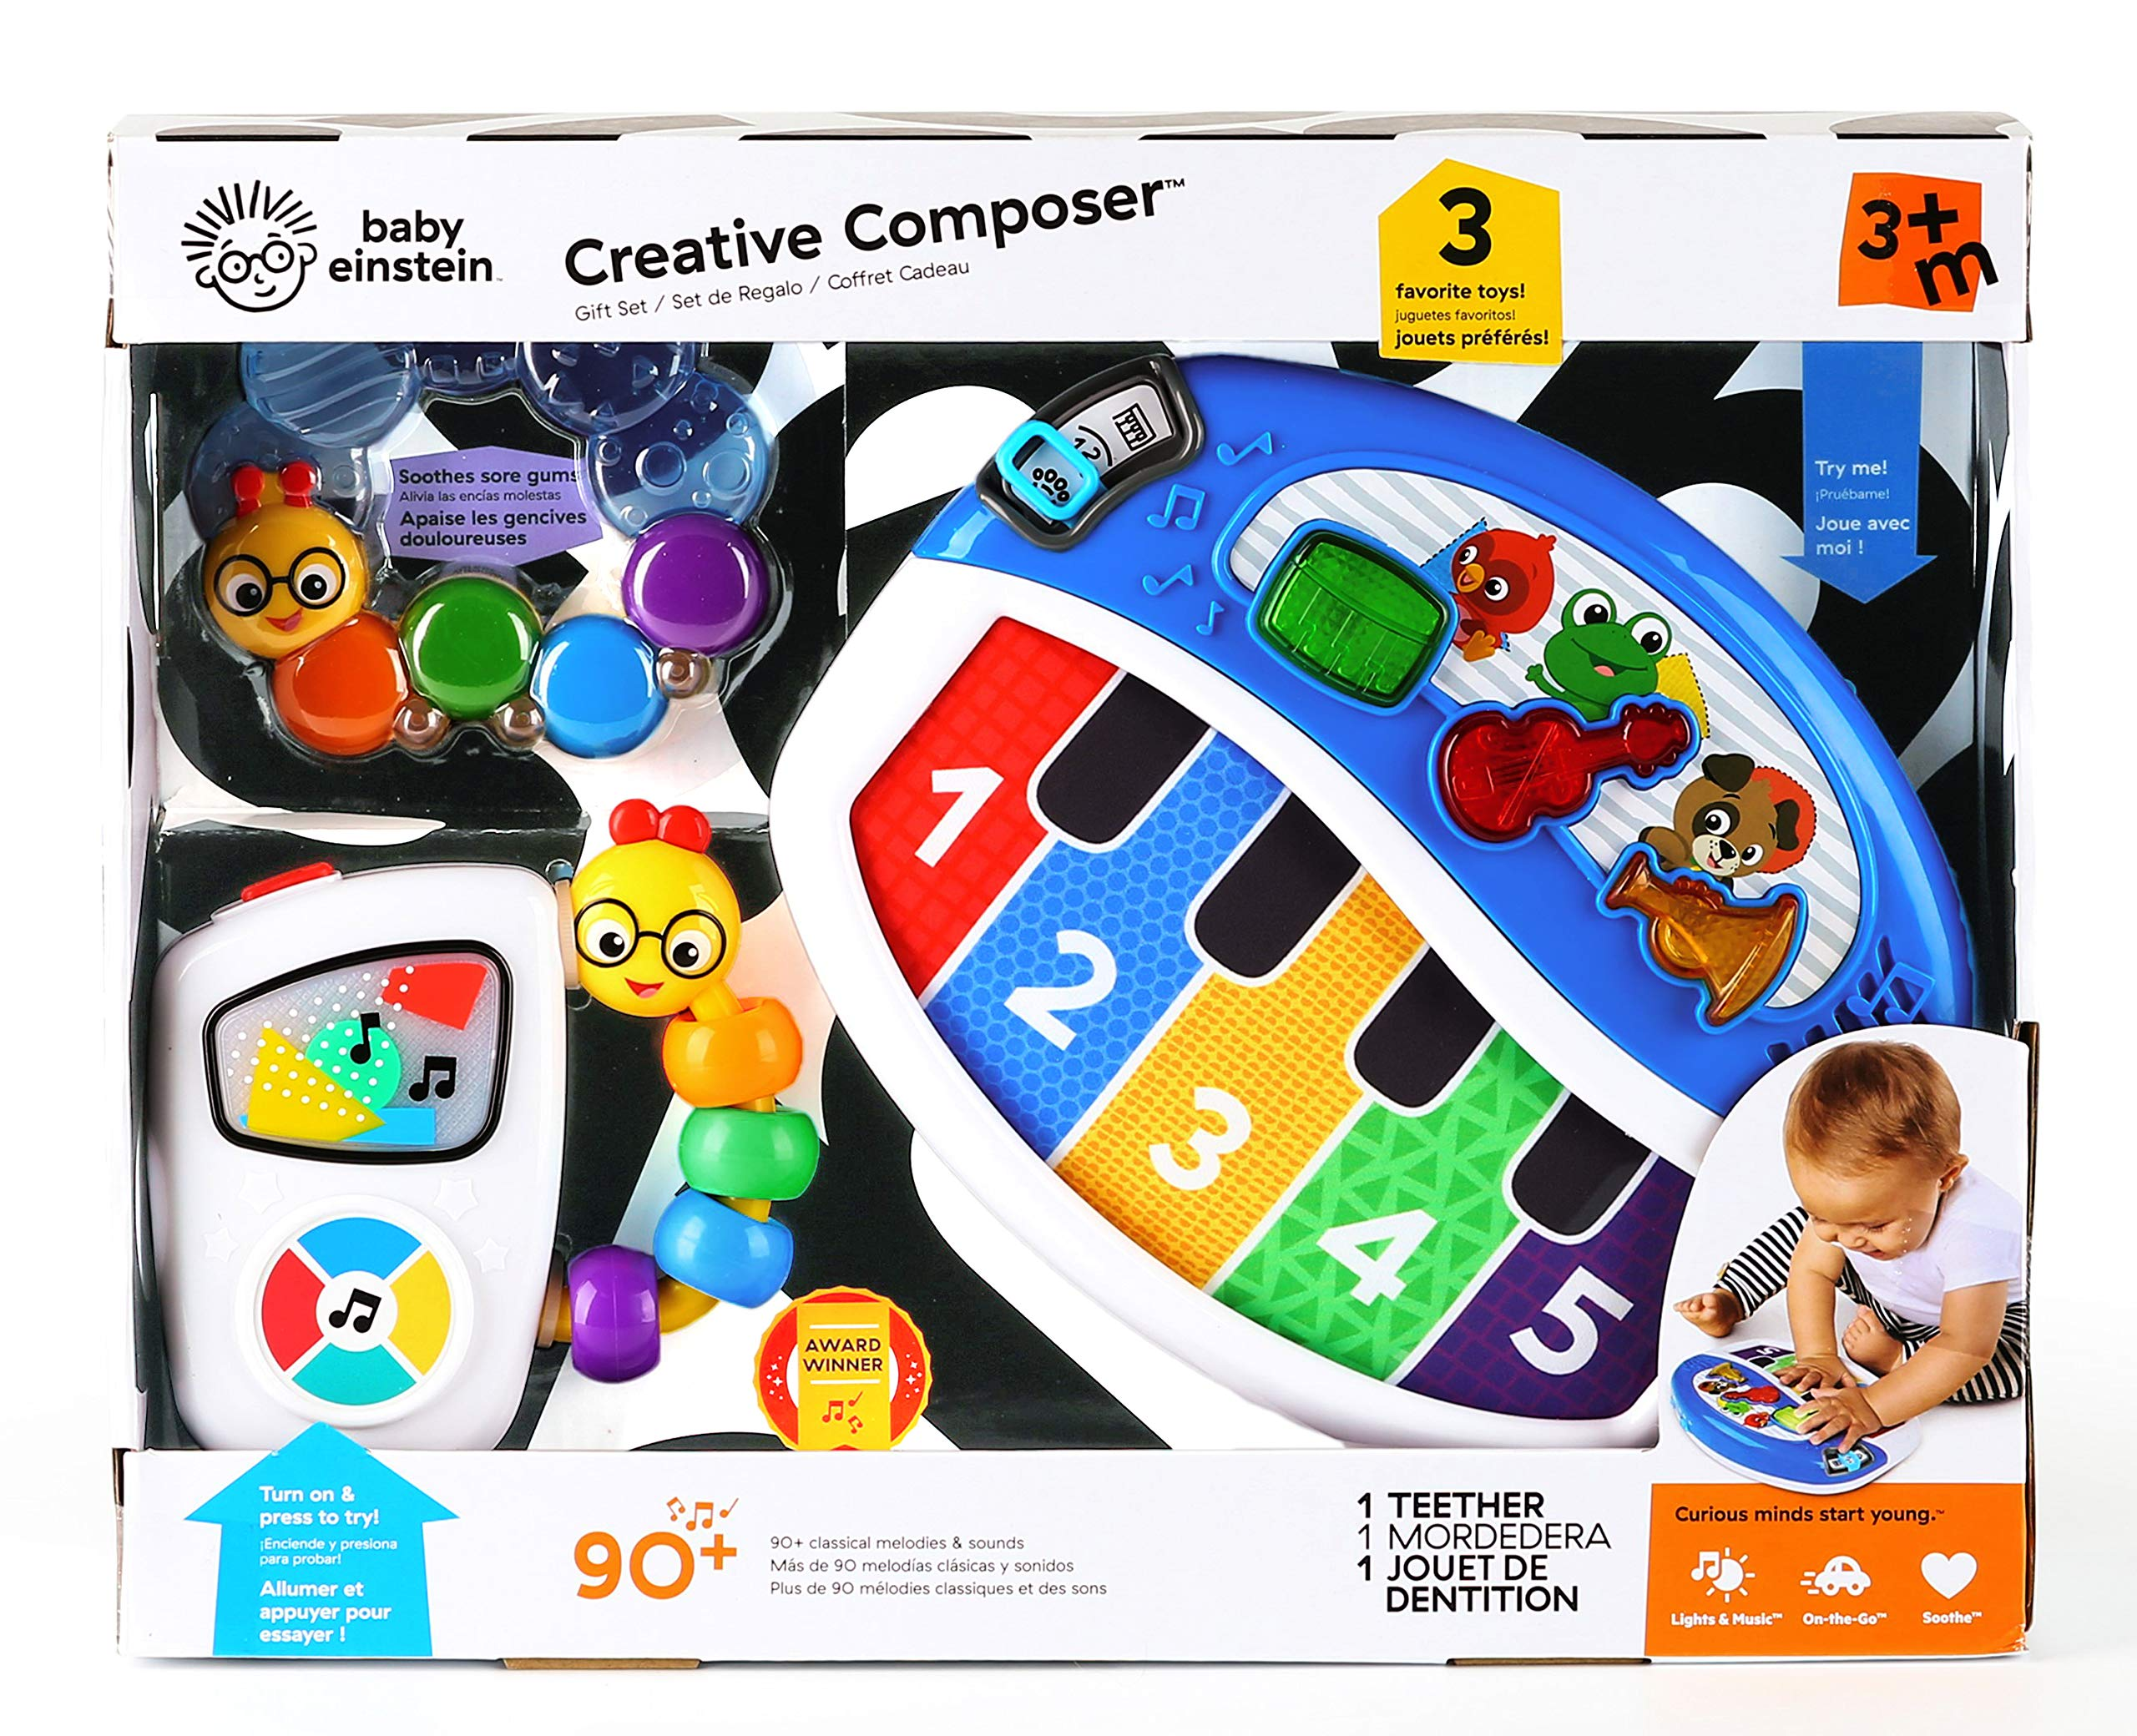 Baby Einstein Creative Composer Musical Toy Gift Set Ages 3 Months +